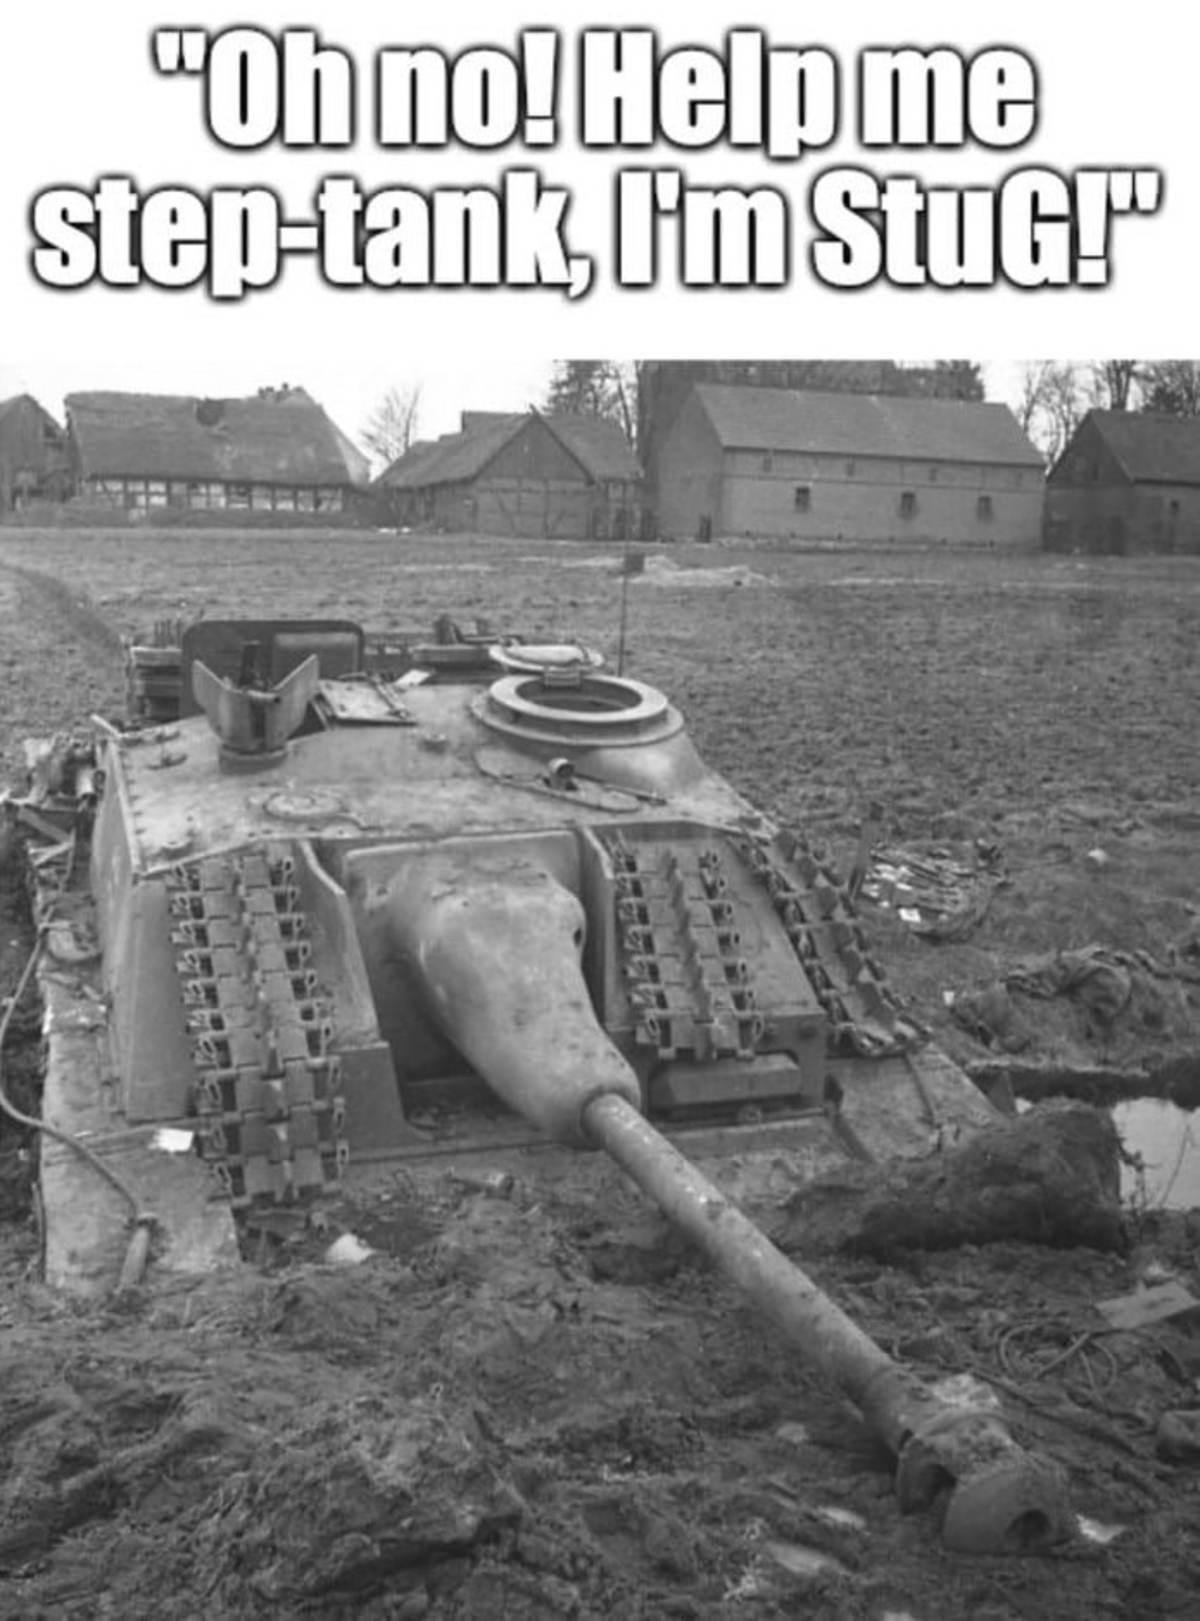 surrogate smelly worldwide Oyster. .. ''Oh no steb tank,helb me im stug XD xD''